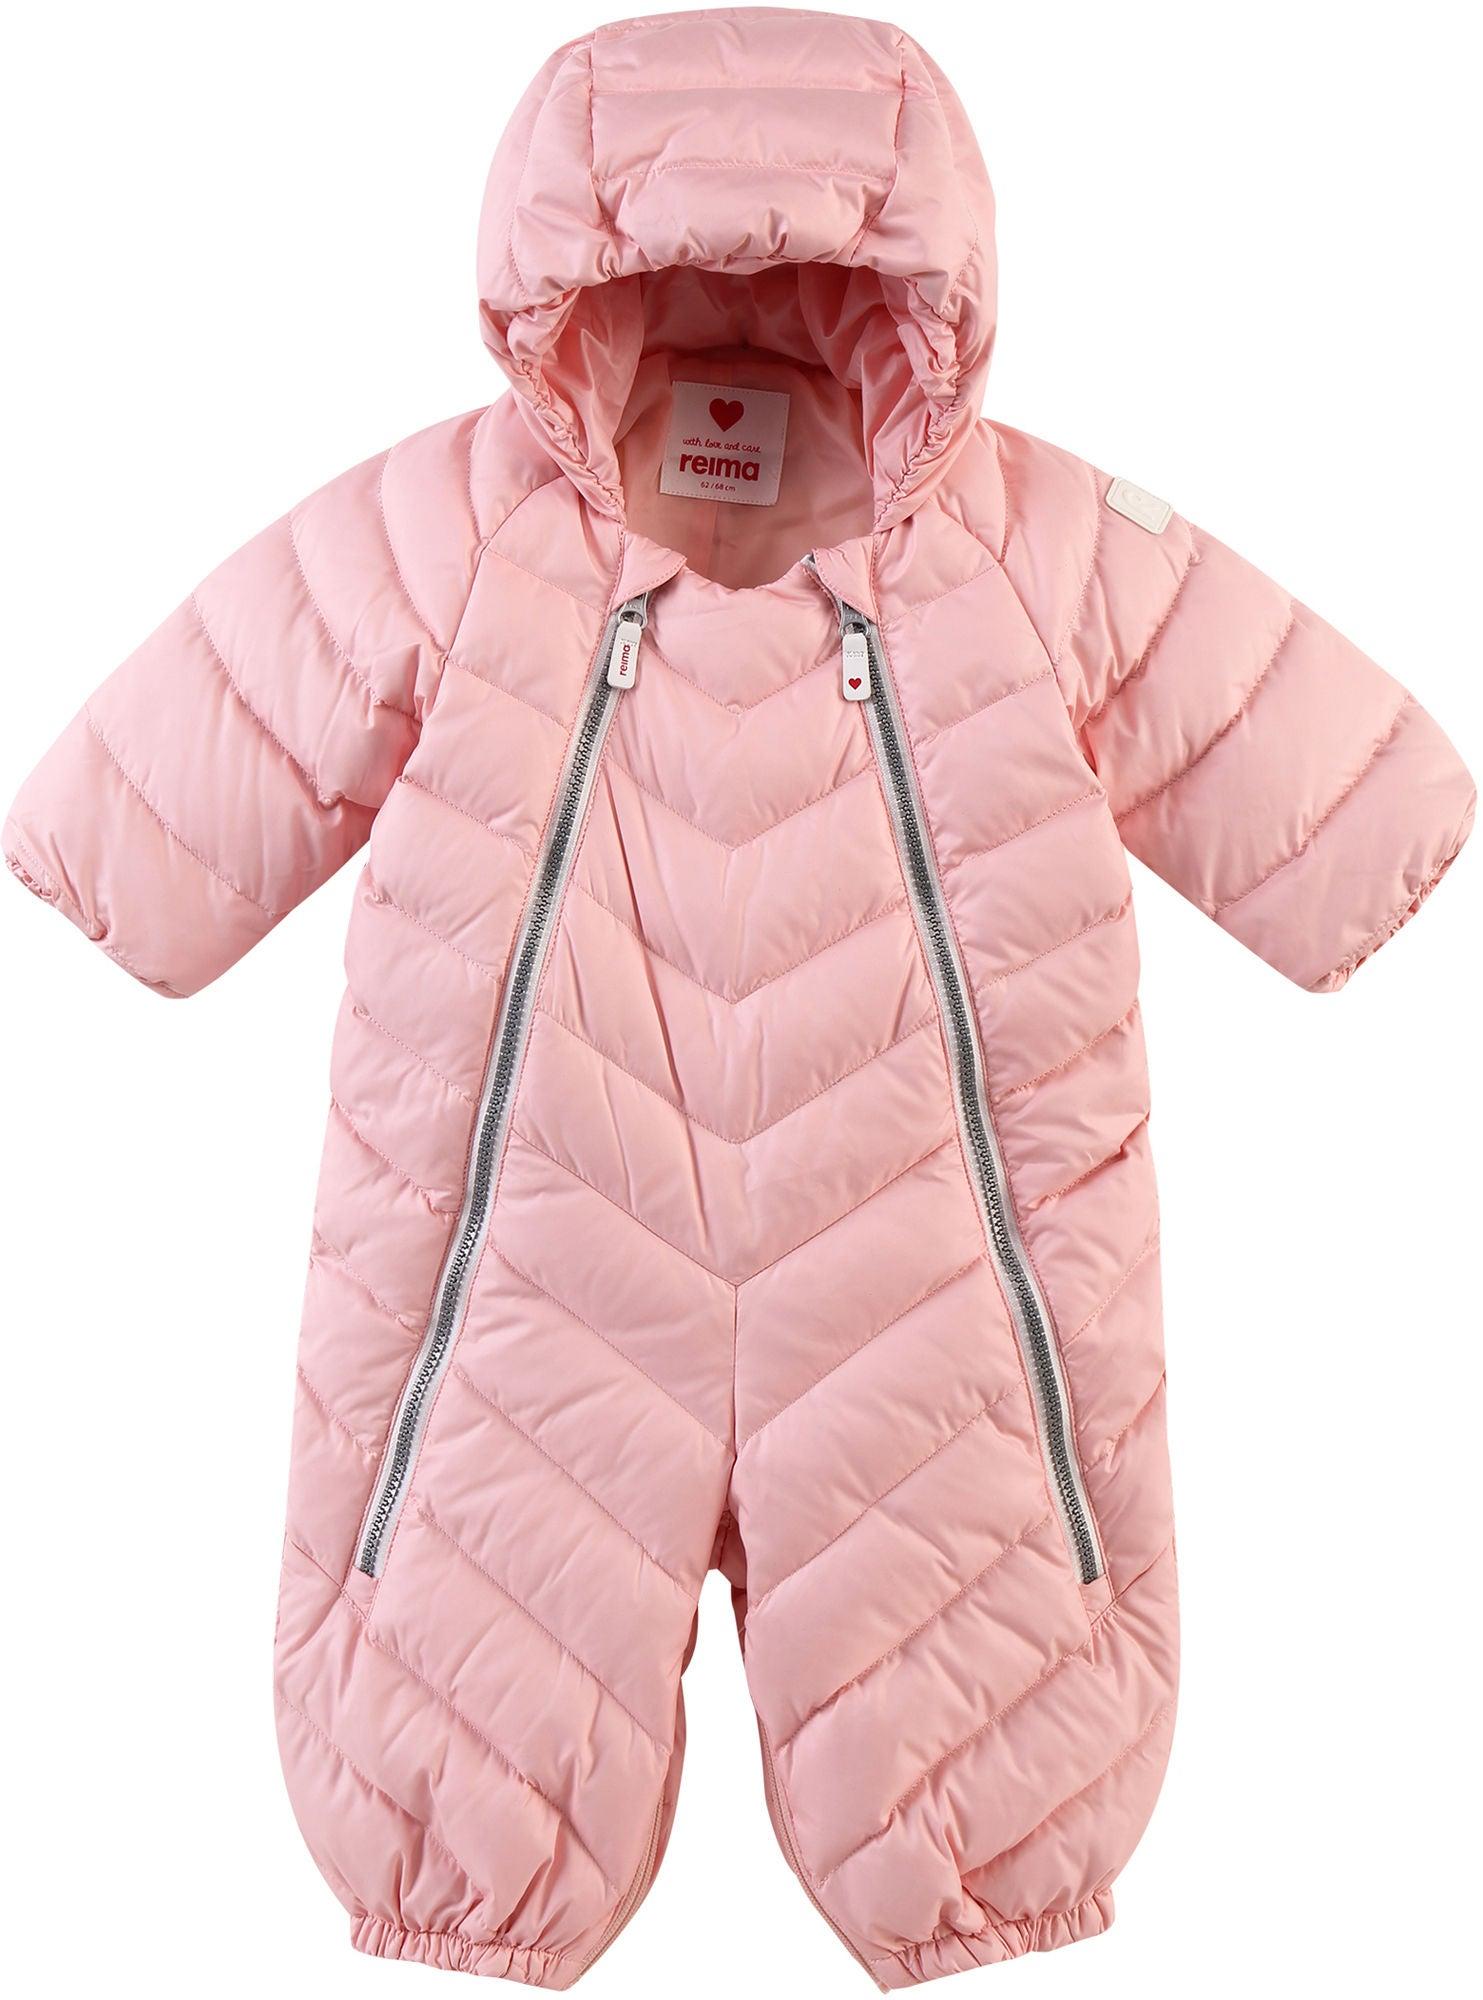 Reimatec Virkaten Babyoverall/Sovpåse, Powder Pink 50-56